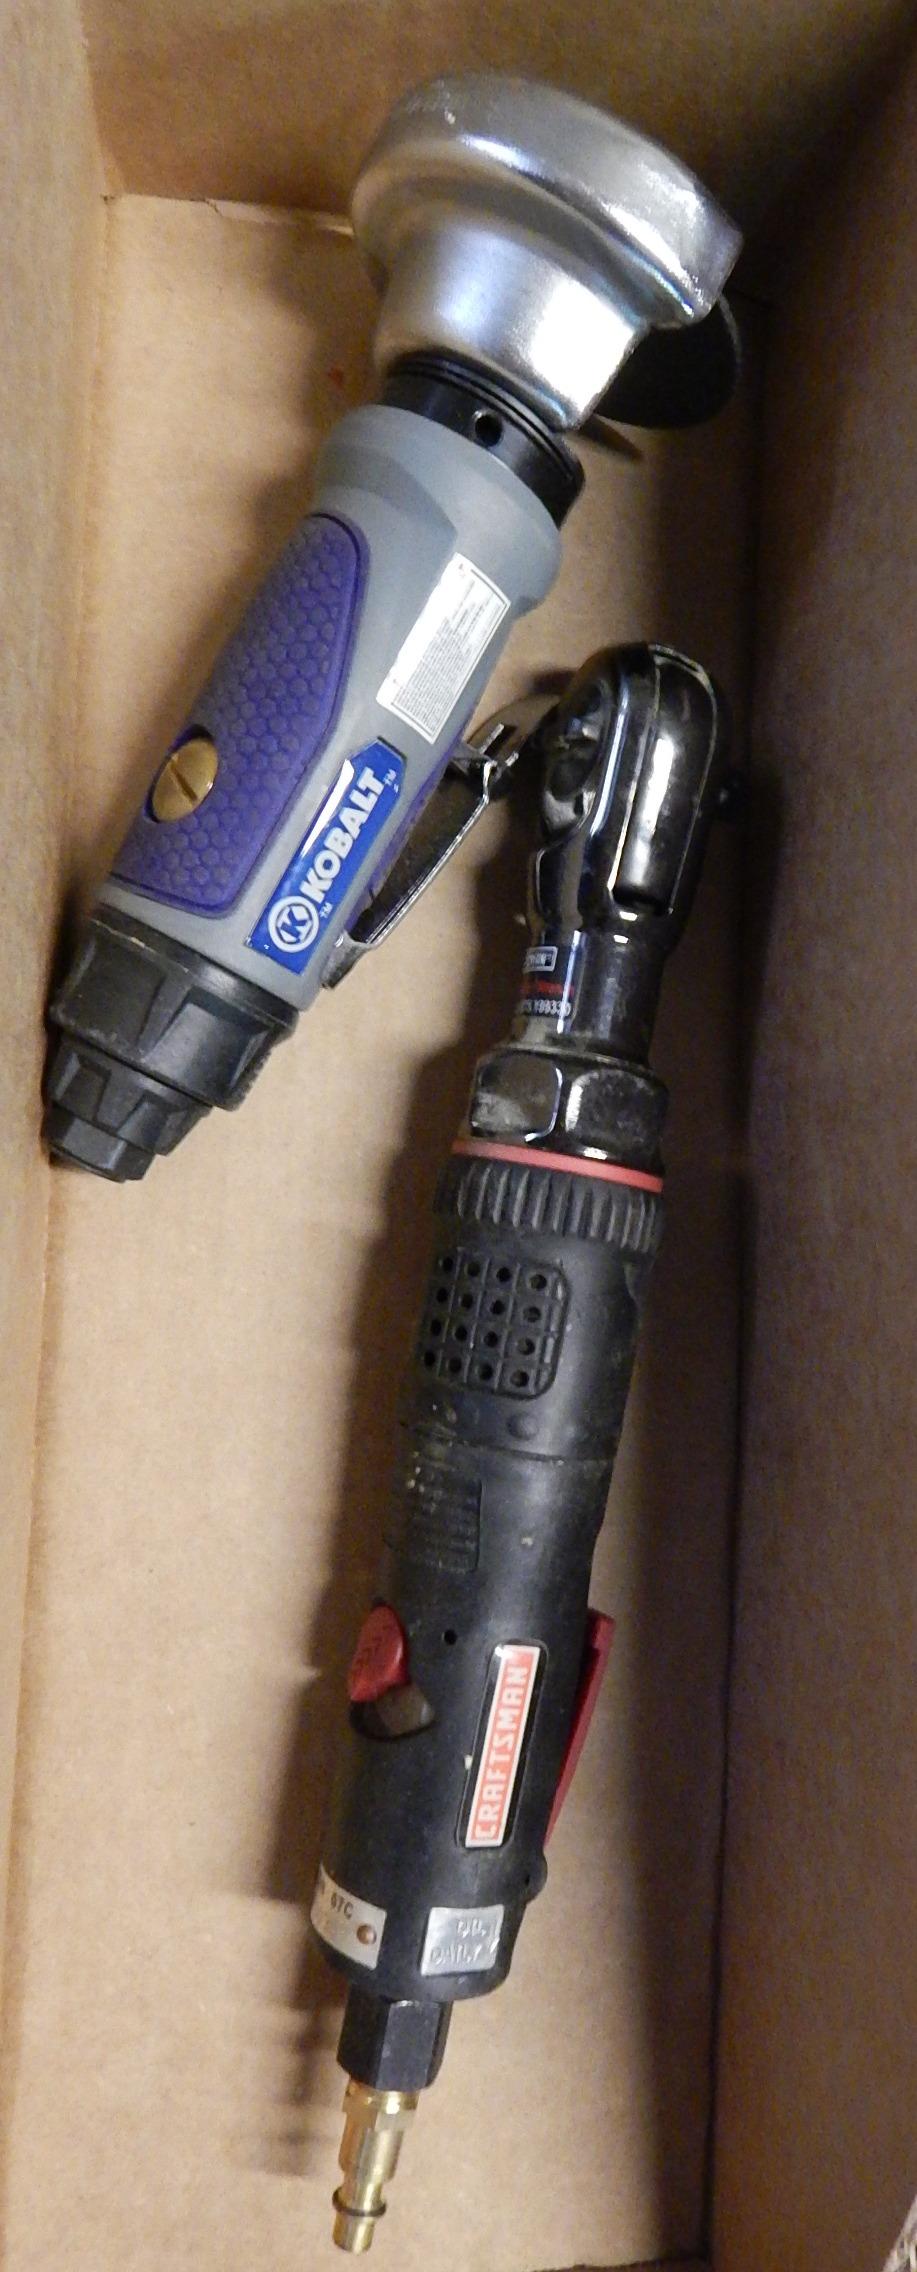 Lot 31 - Kobalt Pneumatic Grinder and Craftsman Pneumatic Ratchet